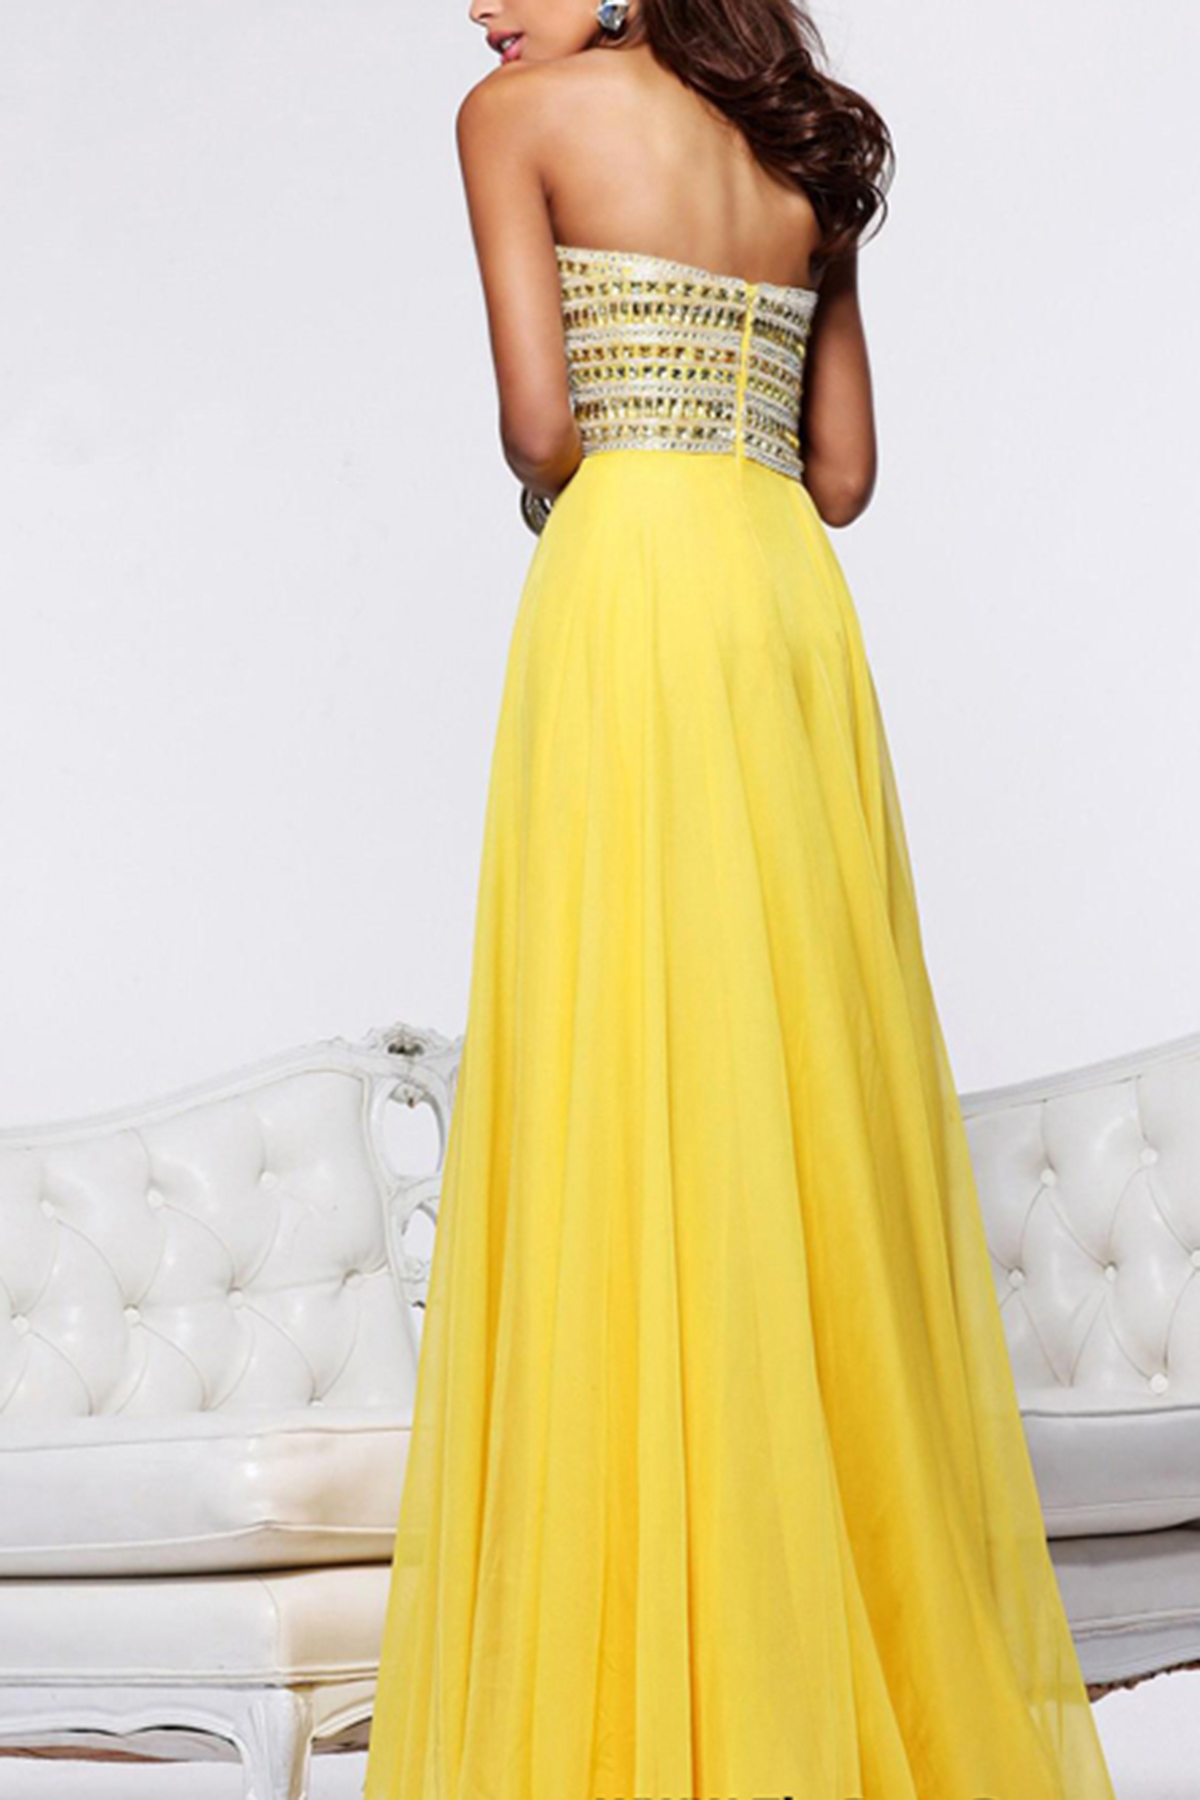 Prom Dress Stores Near Michigan City - Evening Wear